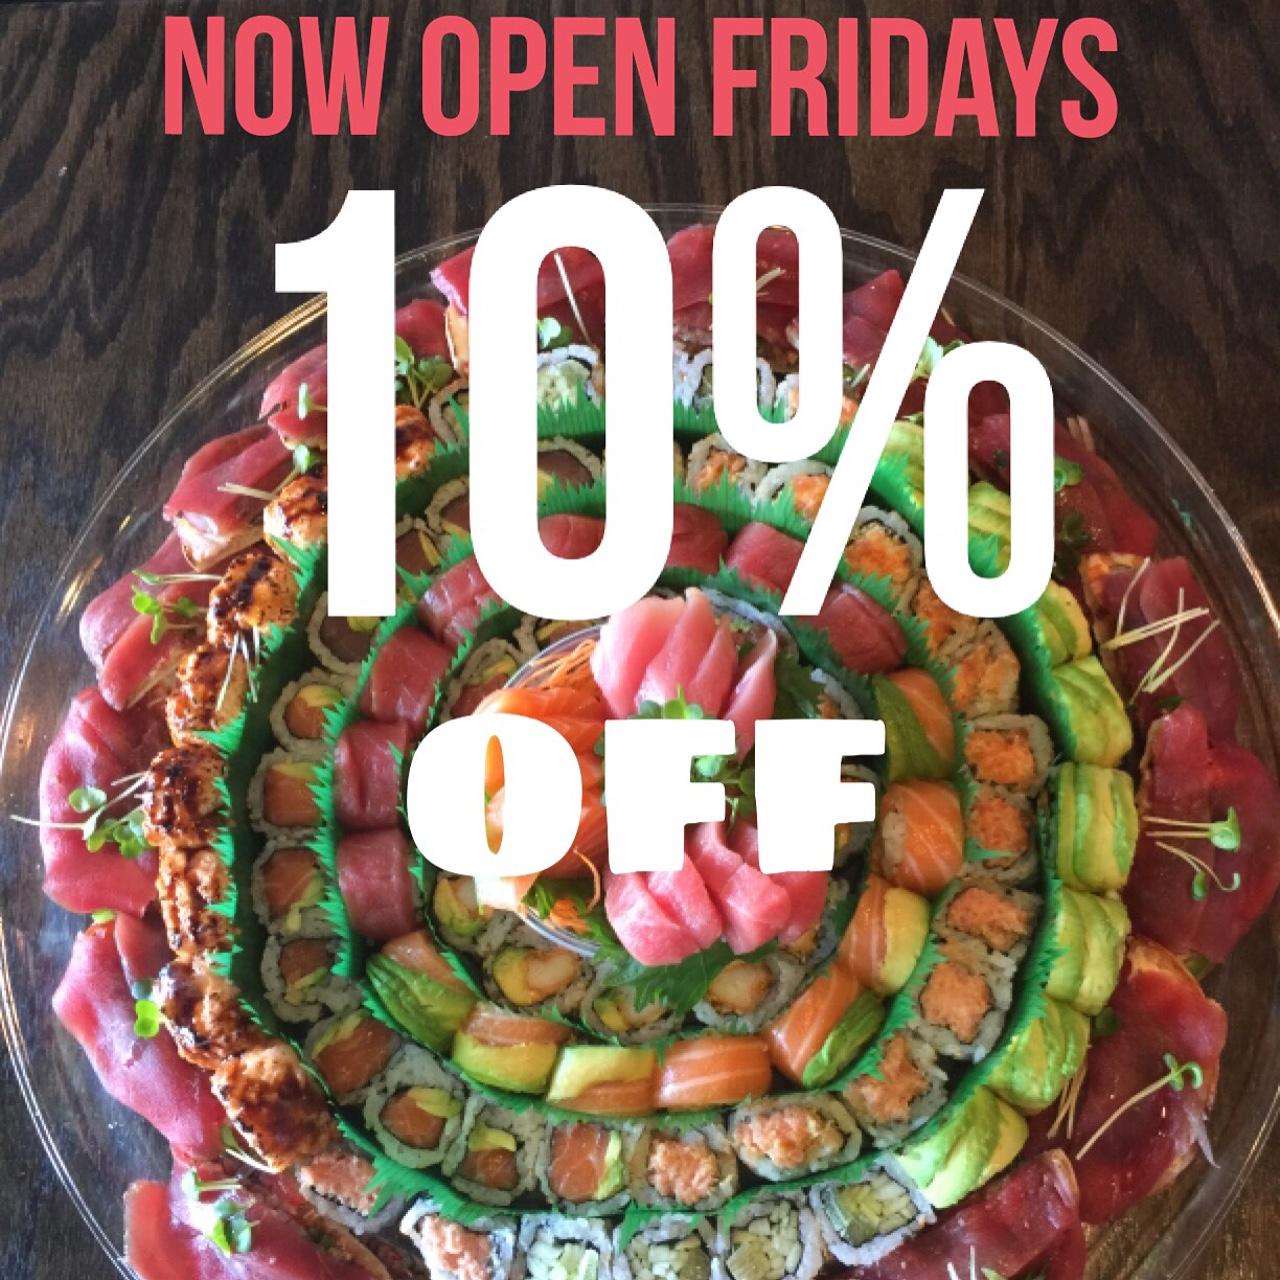 Backyard Coney Island Menu day 5 sushi - great kosher restaurants